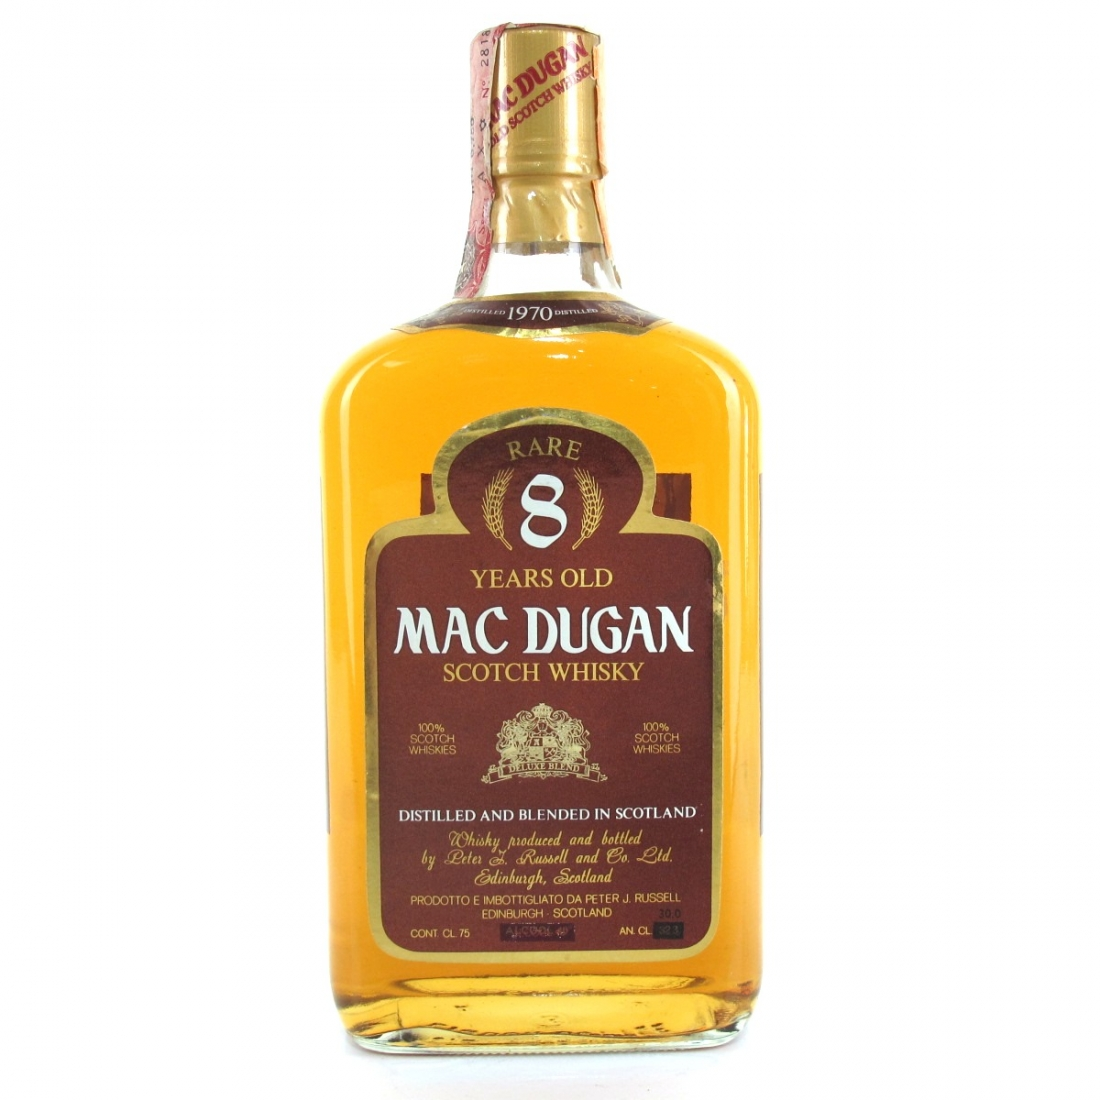 Mac Dugan 1970 8 Year Old Scotch Whisky